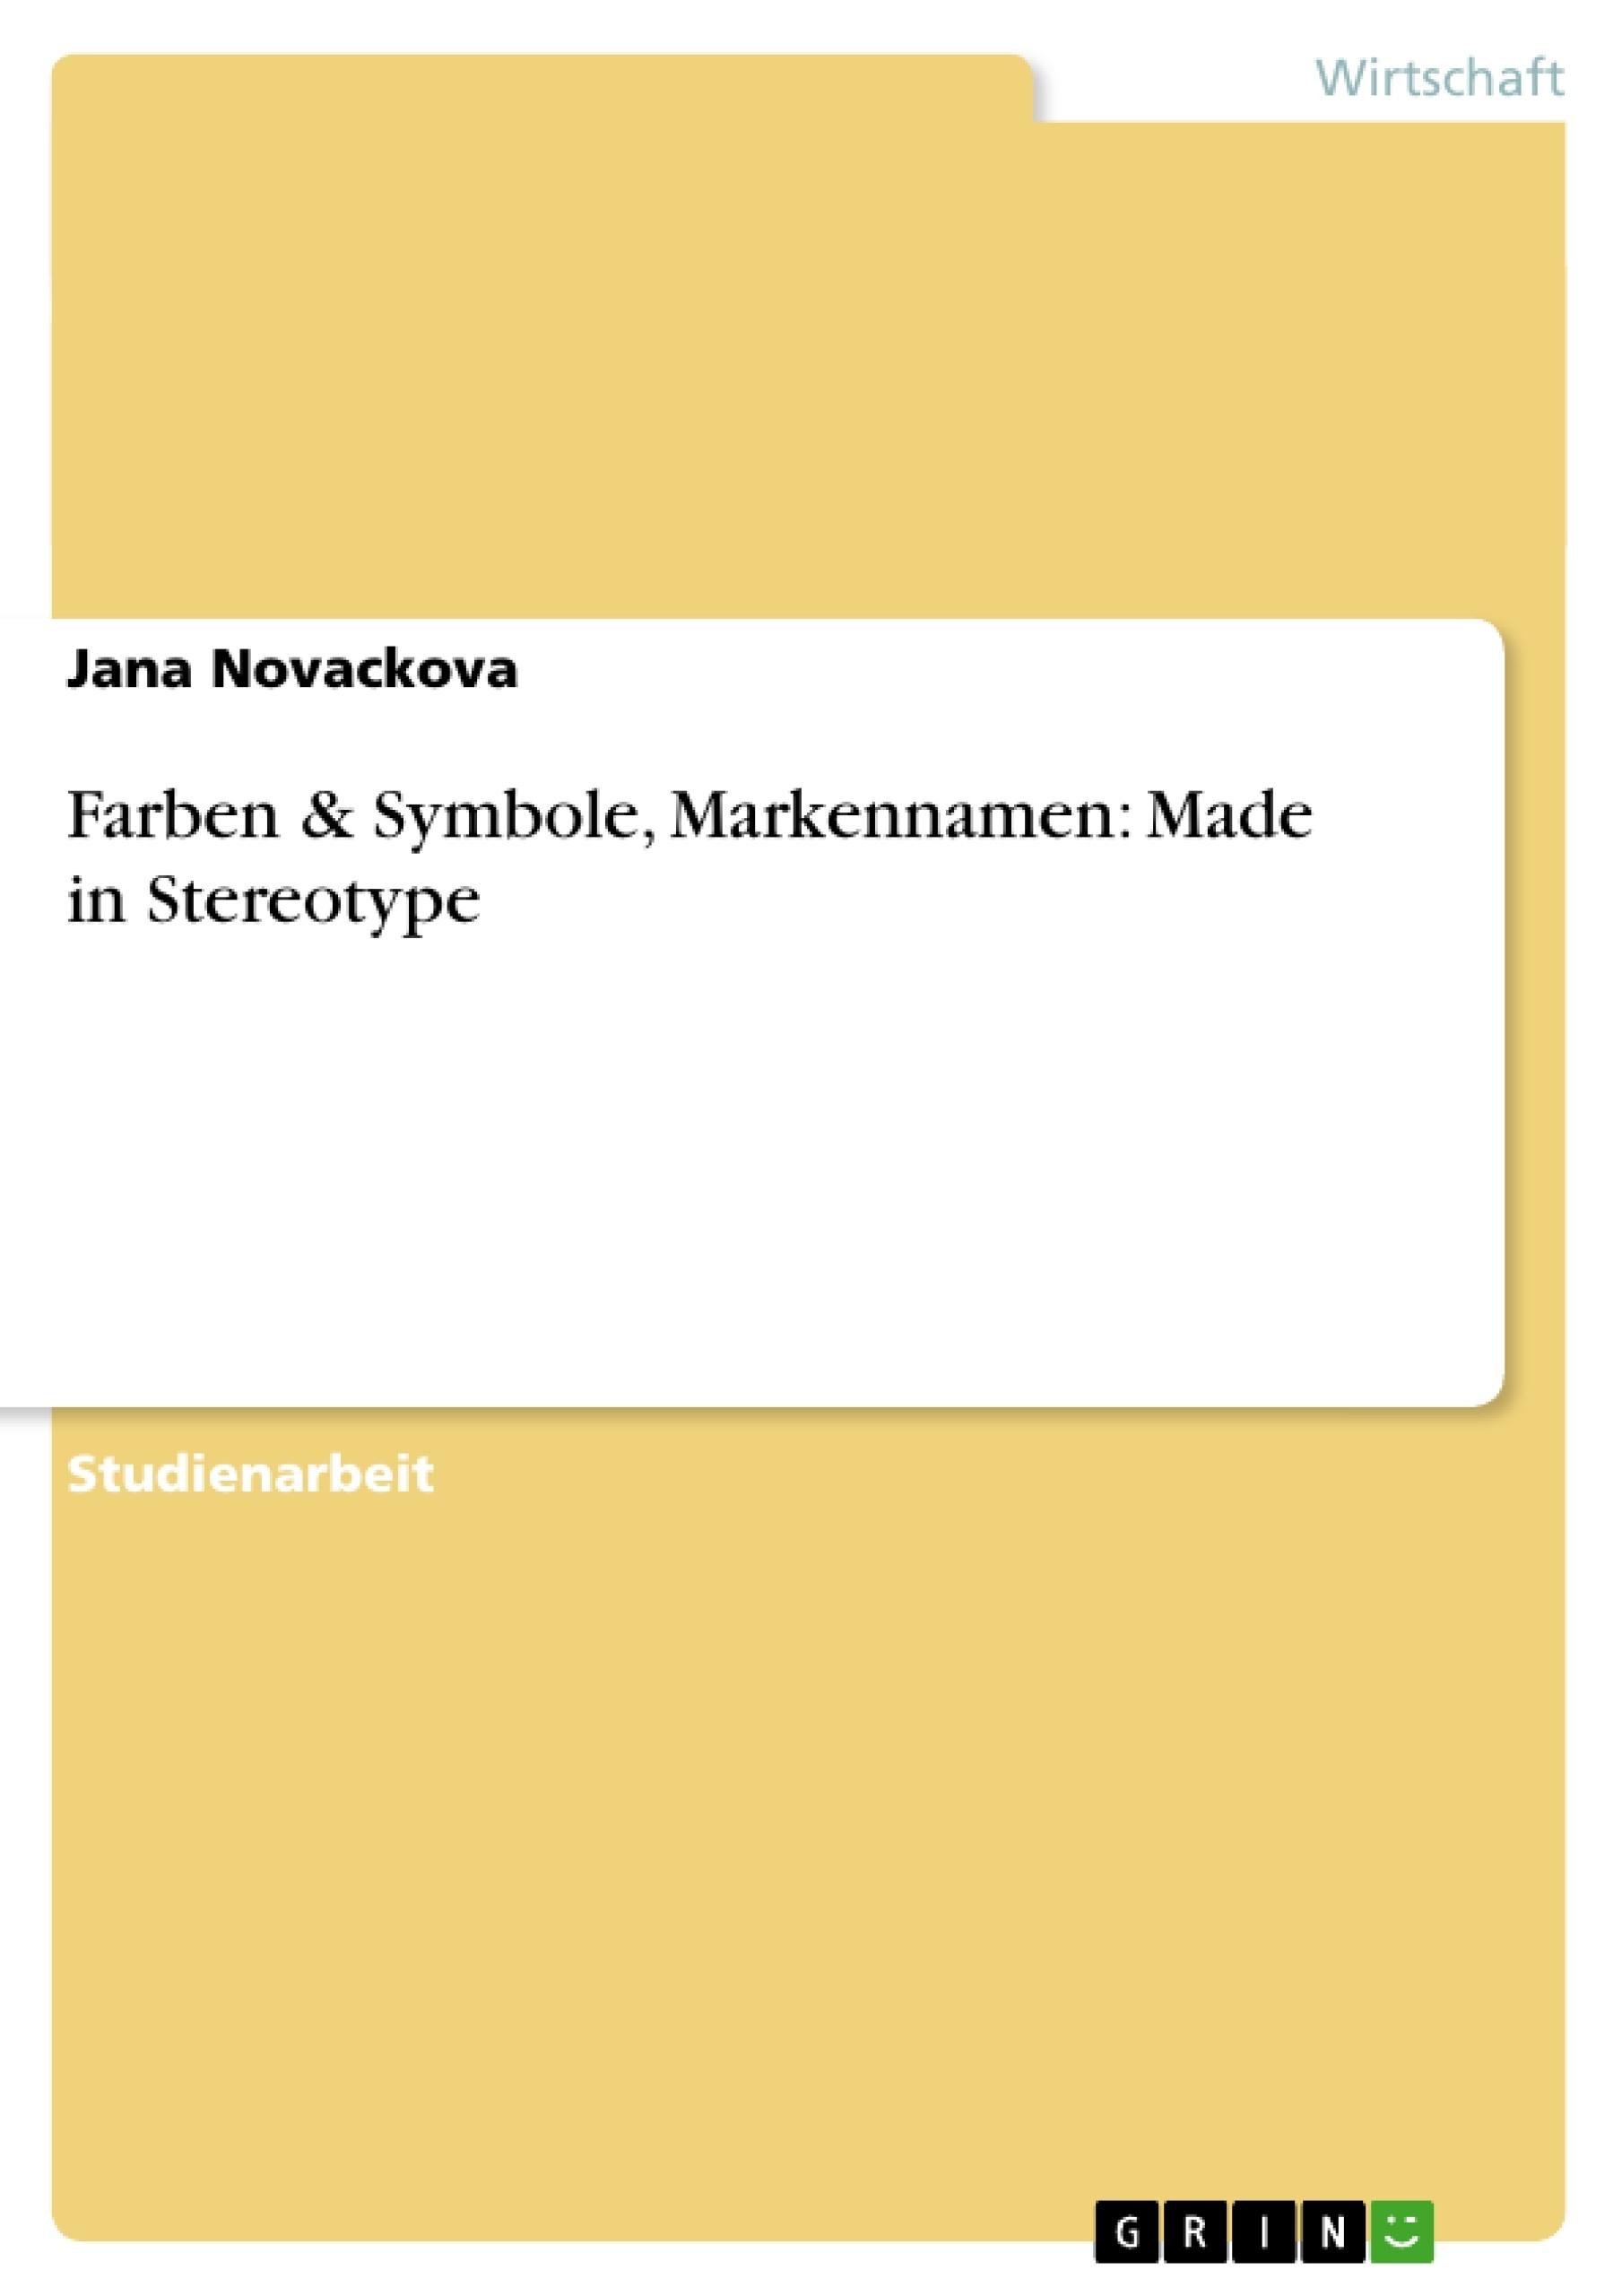 Titel: Farben & Symbole, Markennamen: Made in Stereotype